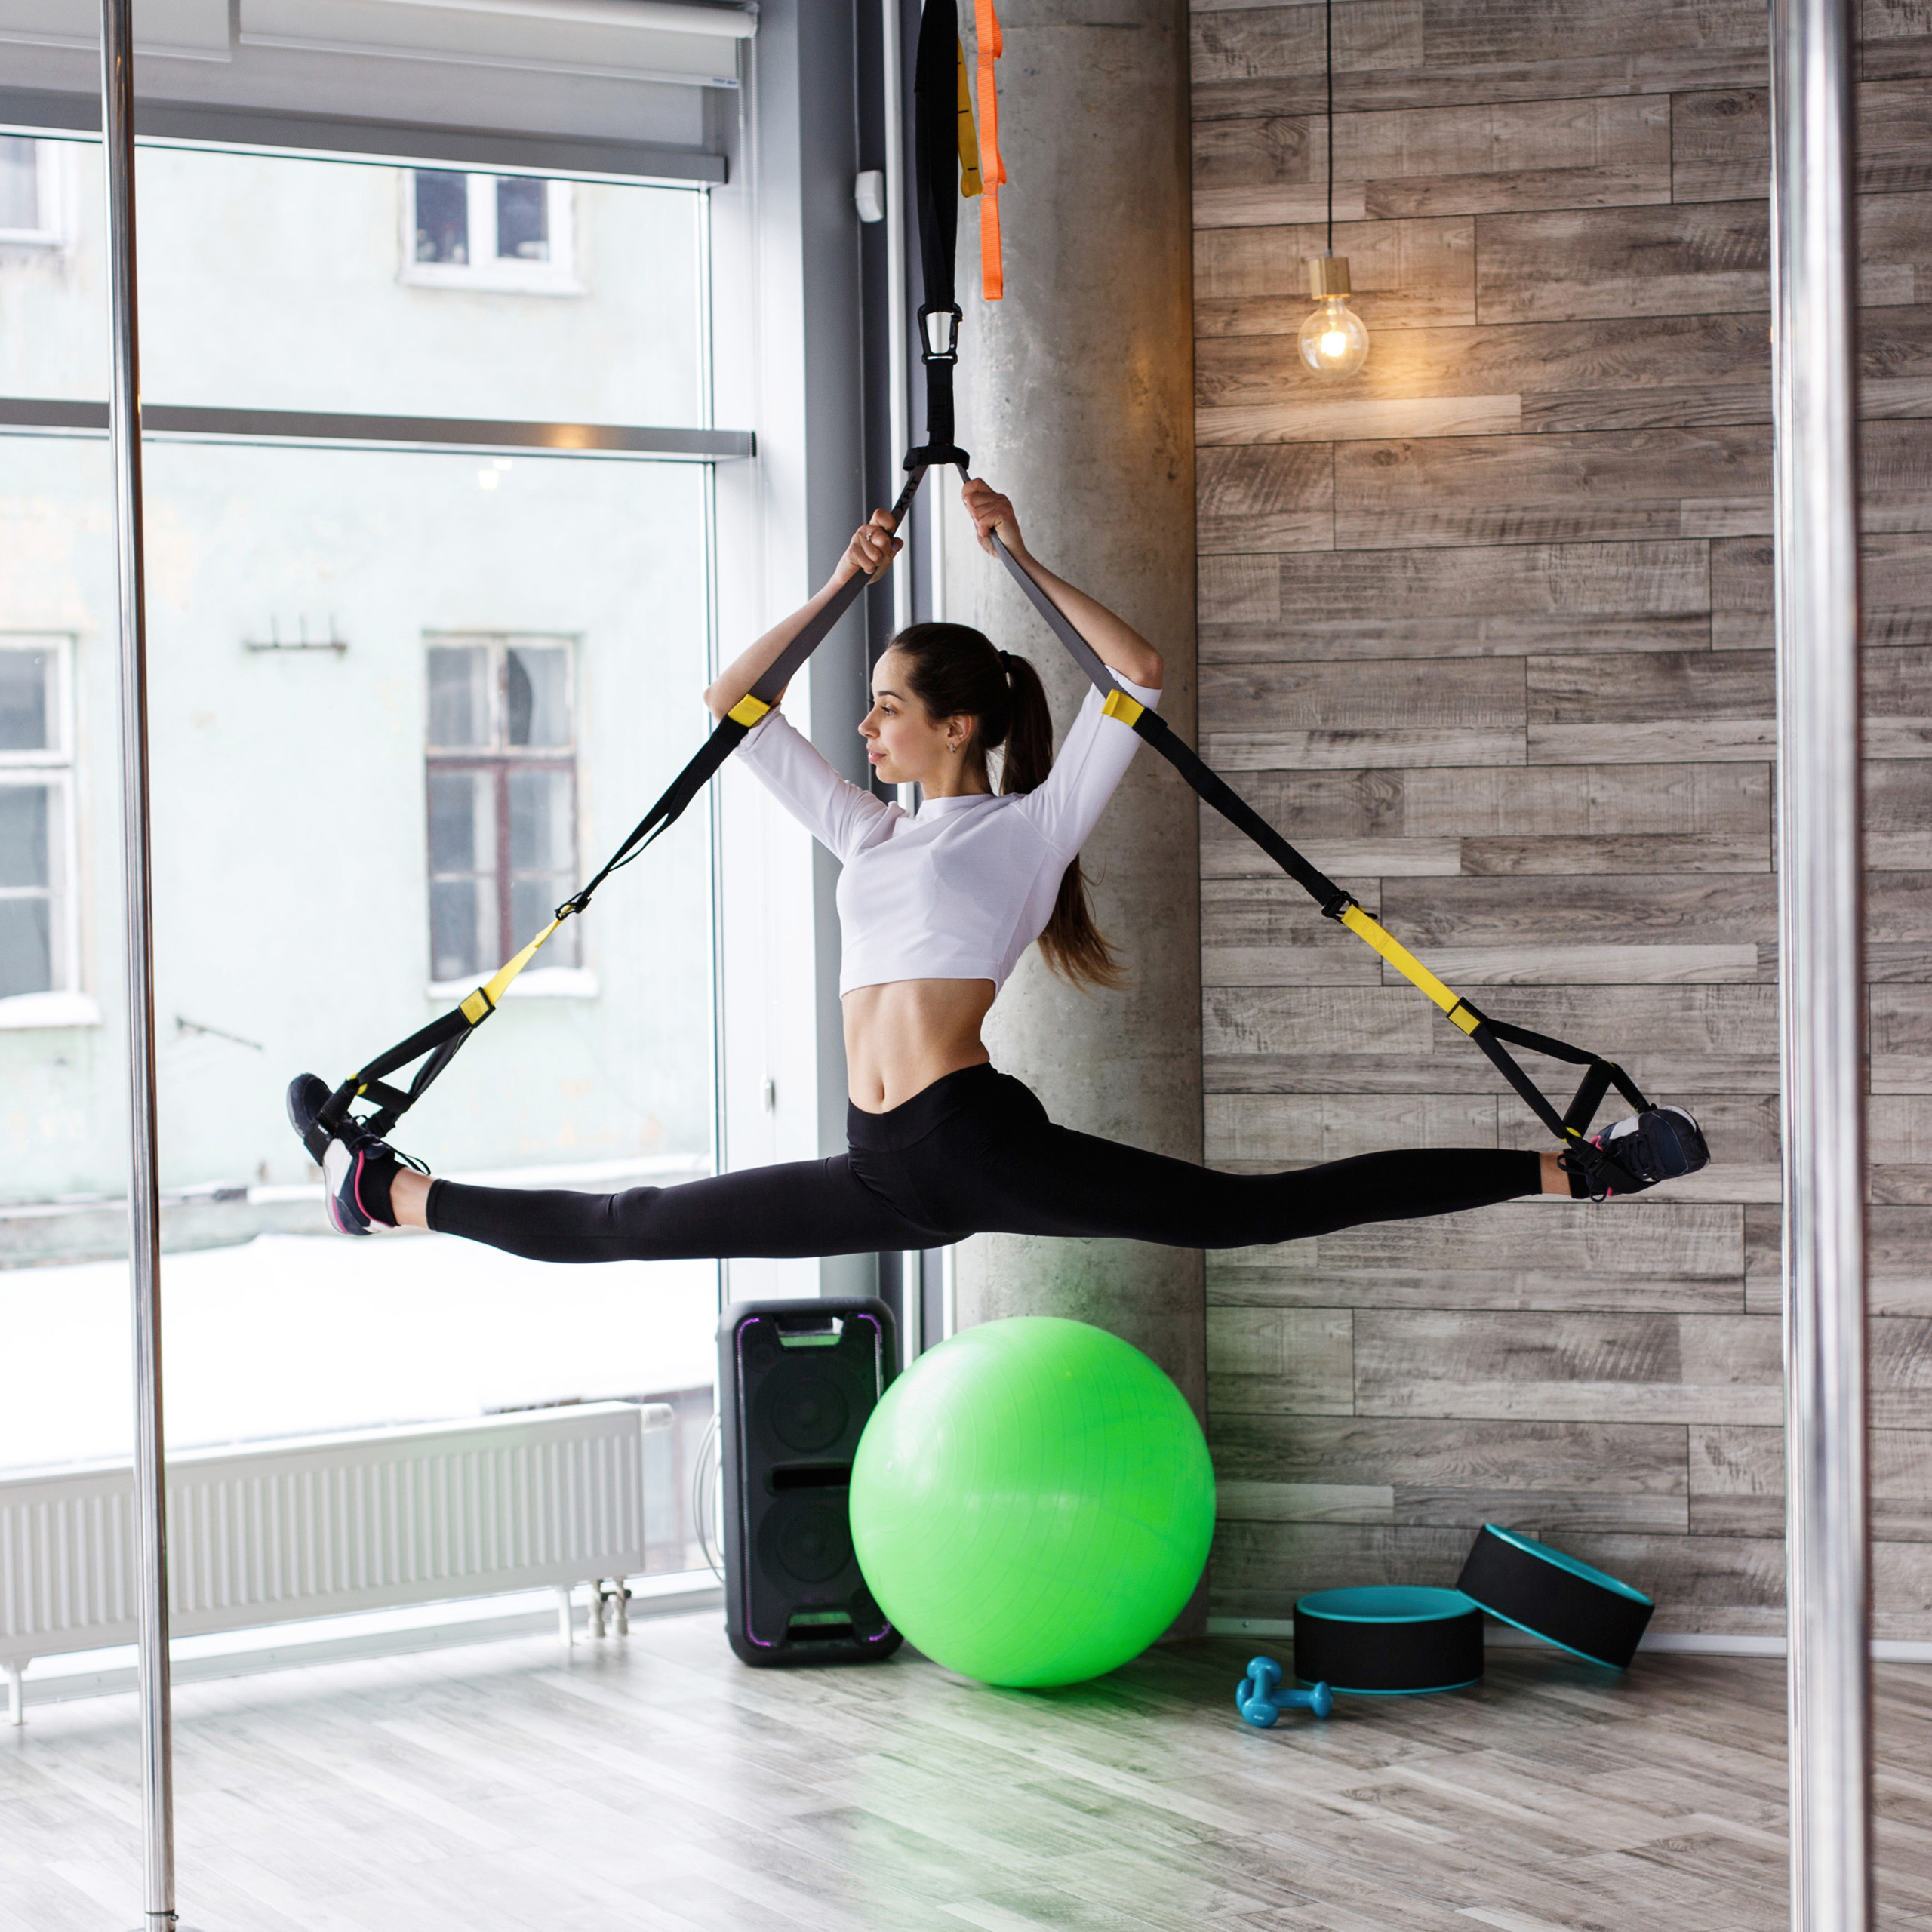 Exercise-Ball-75-cm-PVC-Yoga-Ball-Office-Seat-Gym-Ball-Pilates thumbnail 20